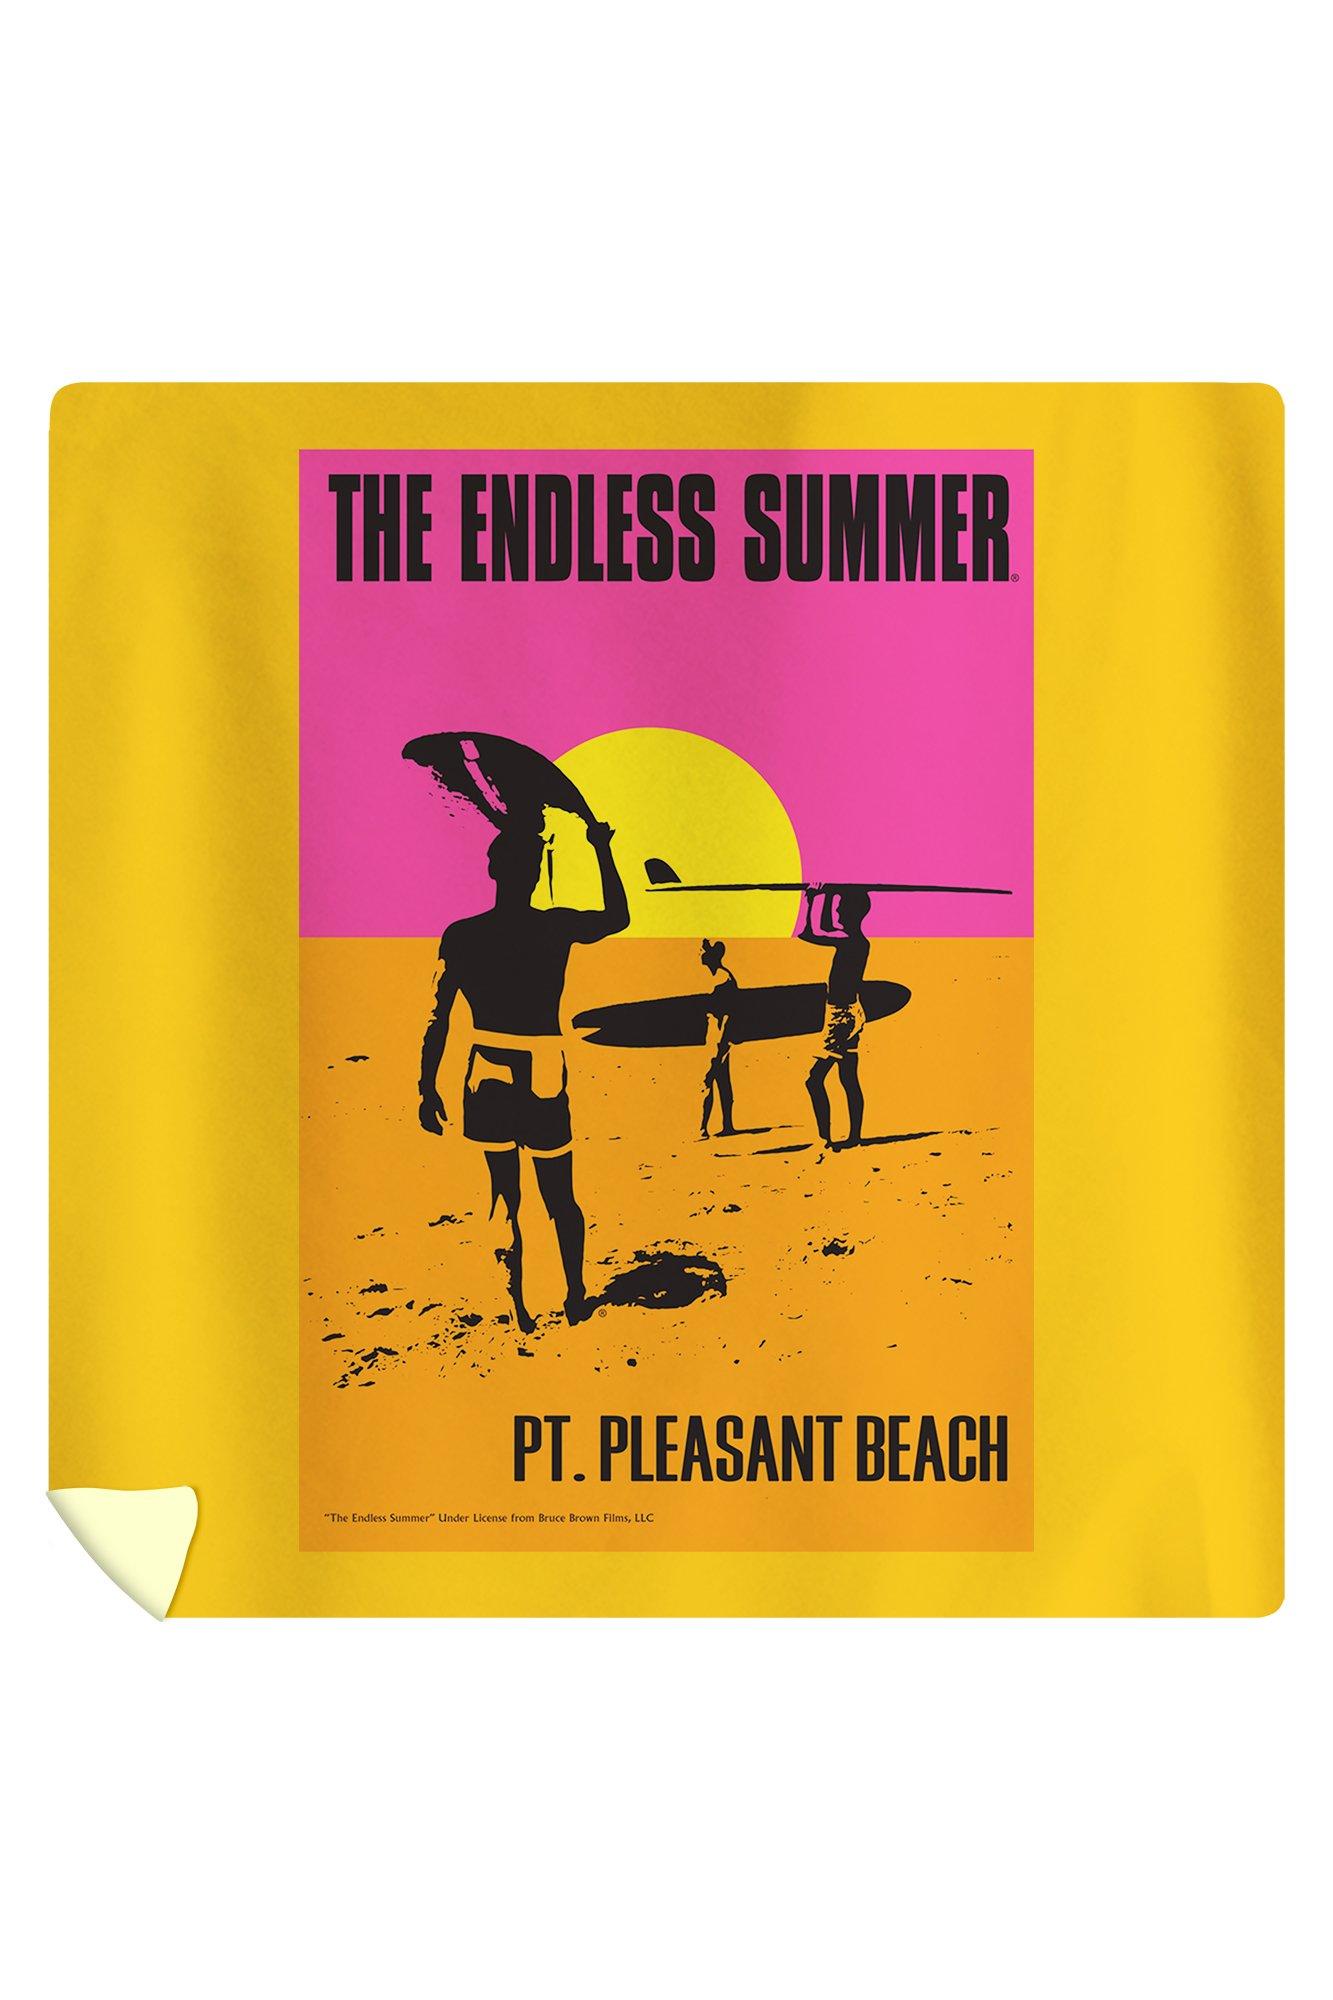 Pt. Pleasant Beach, New Jersey - The Endless Summer - Original Movie Poster (88x88 Queen Microfiber Duvet Cover)